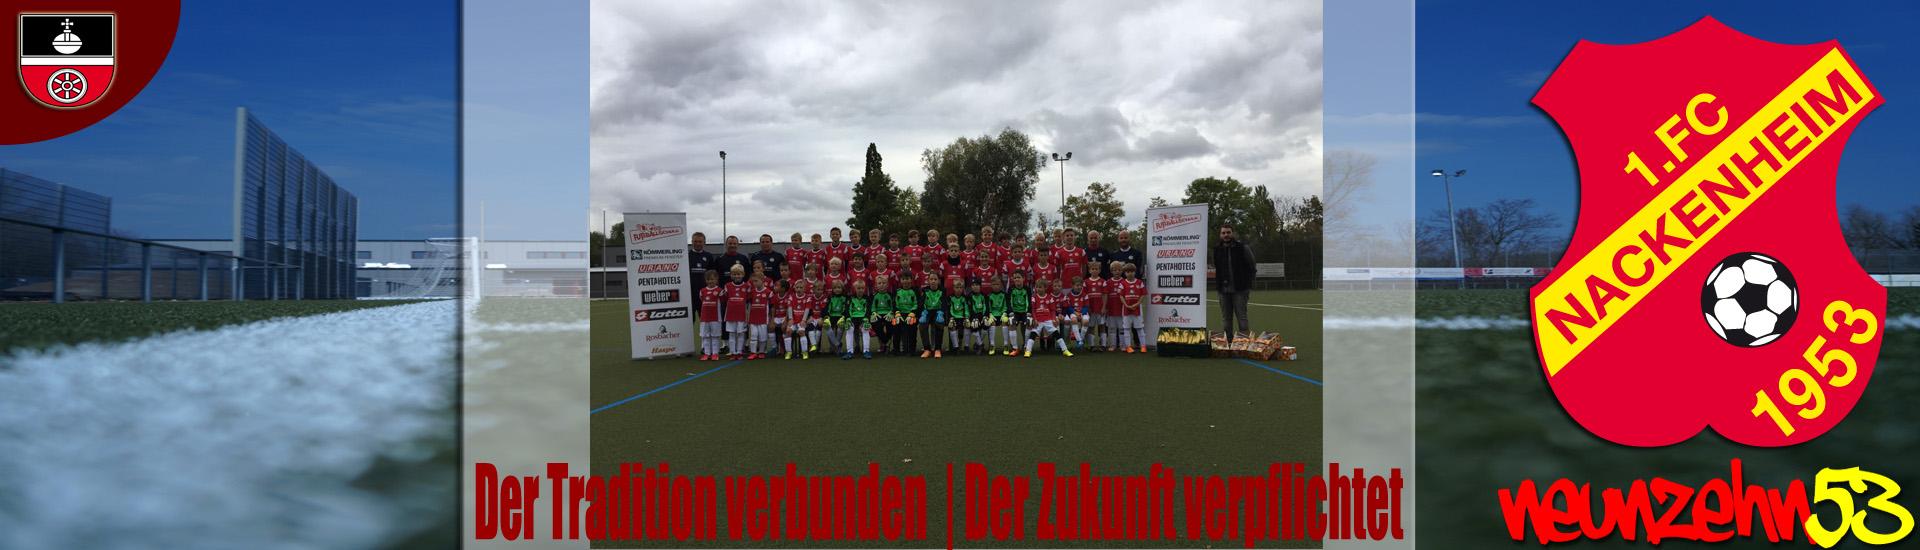 05er-fussballschule-in-nackenheim